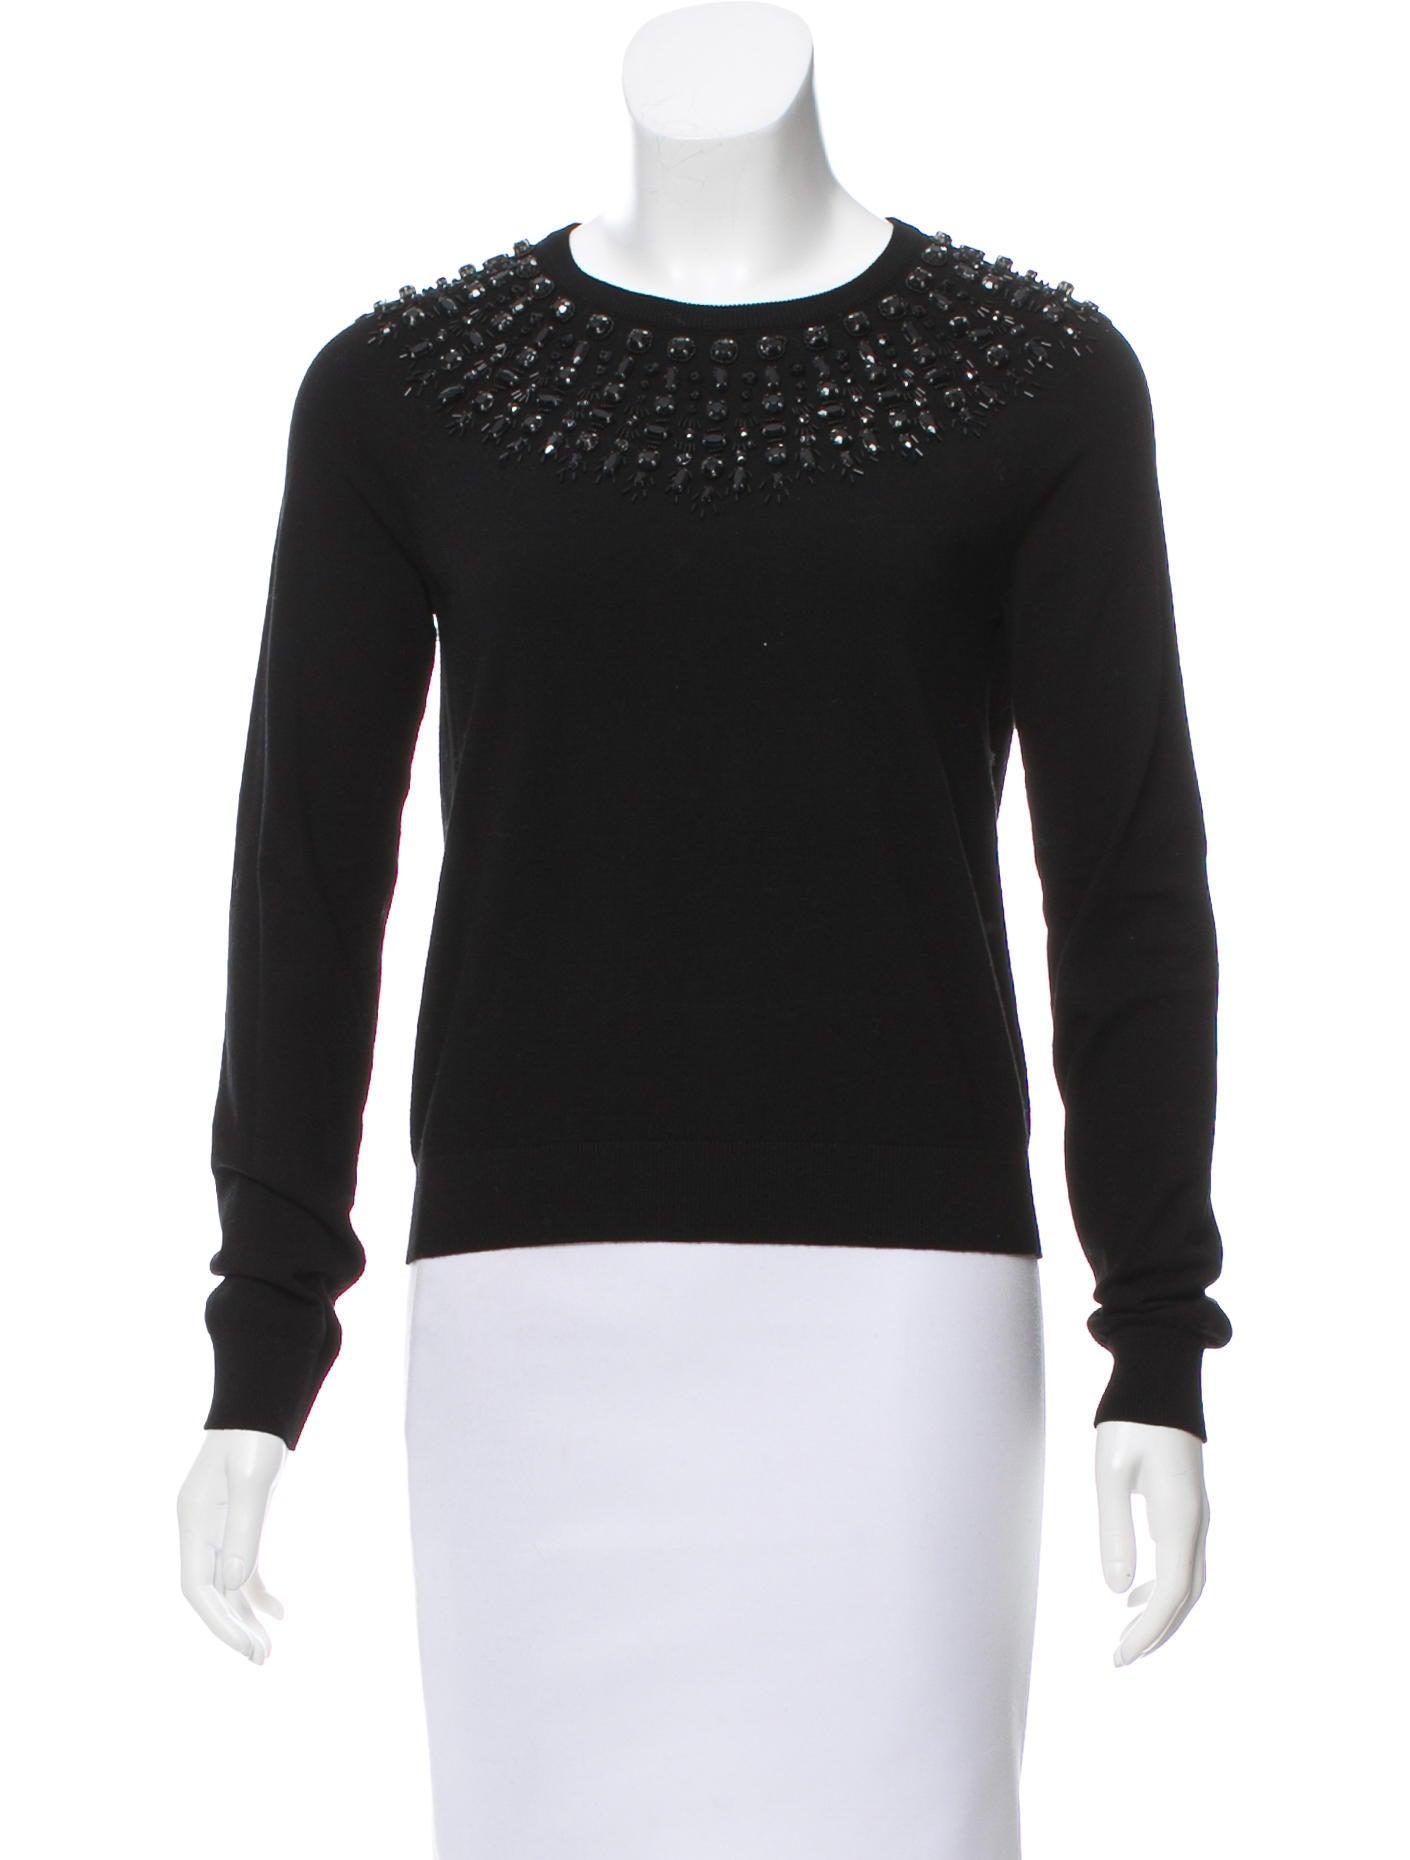 b8ada067886 Milly Embellished Knit Sweater - Clothing - WM623948